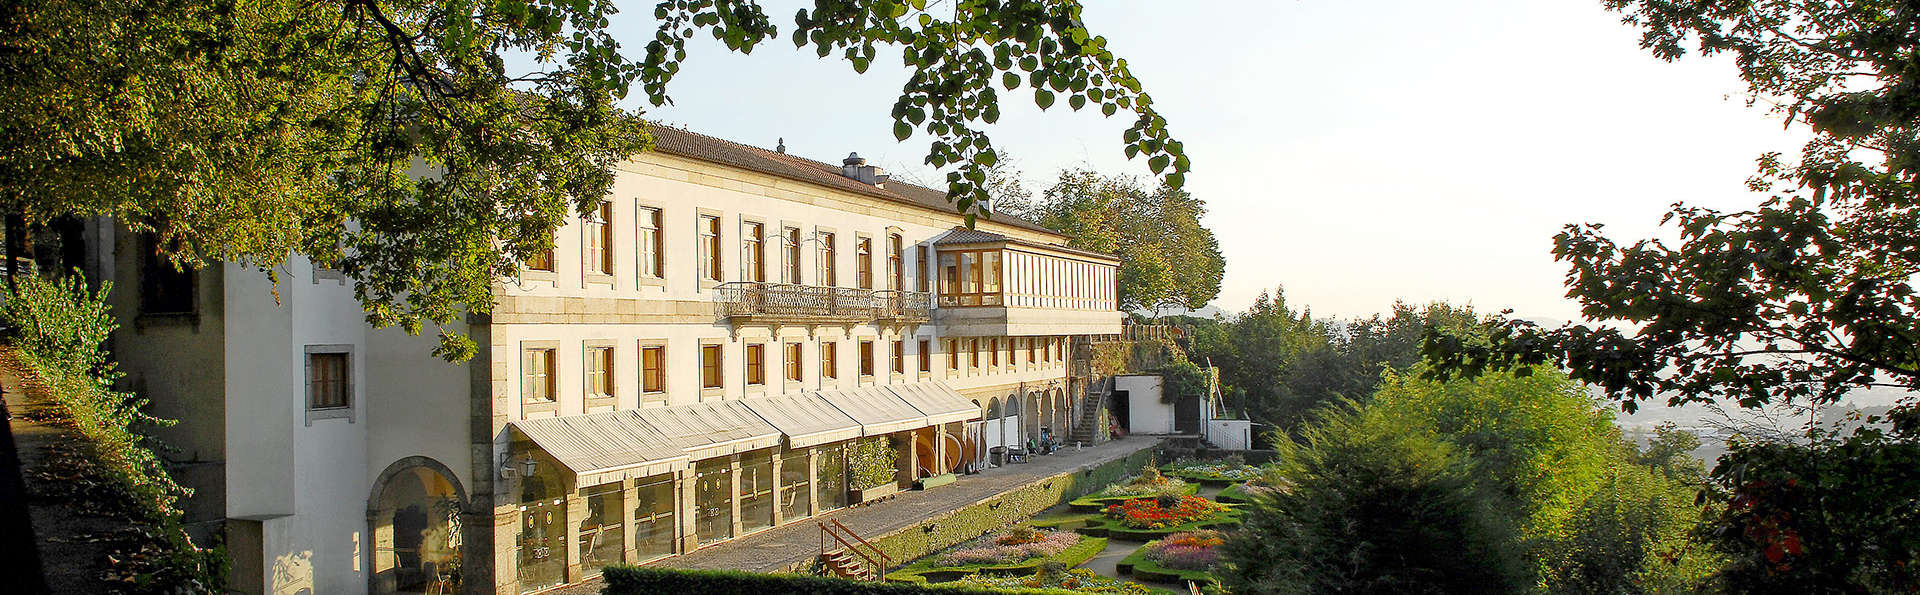 Hotel do Elevador - edit_garden.jpg